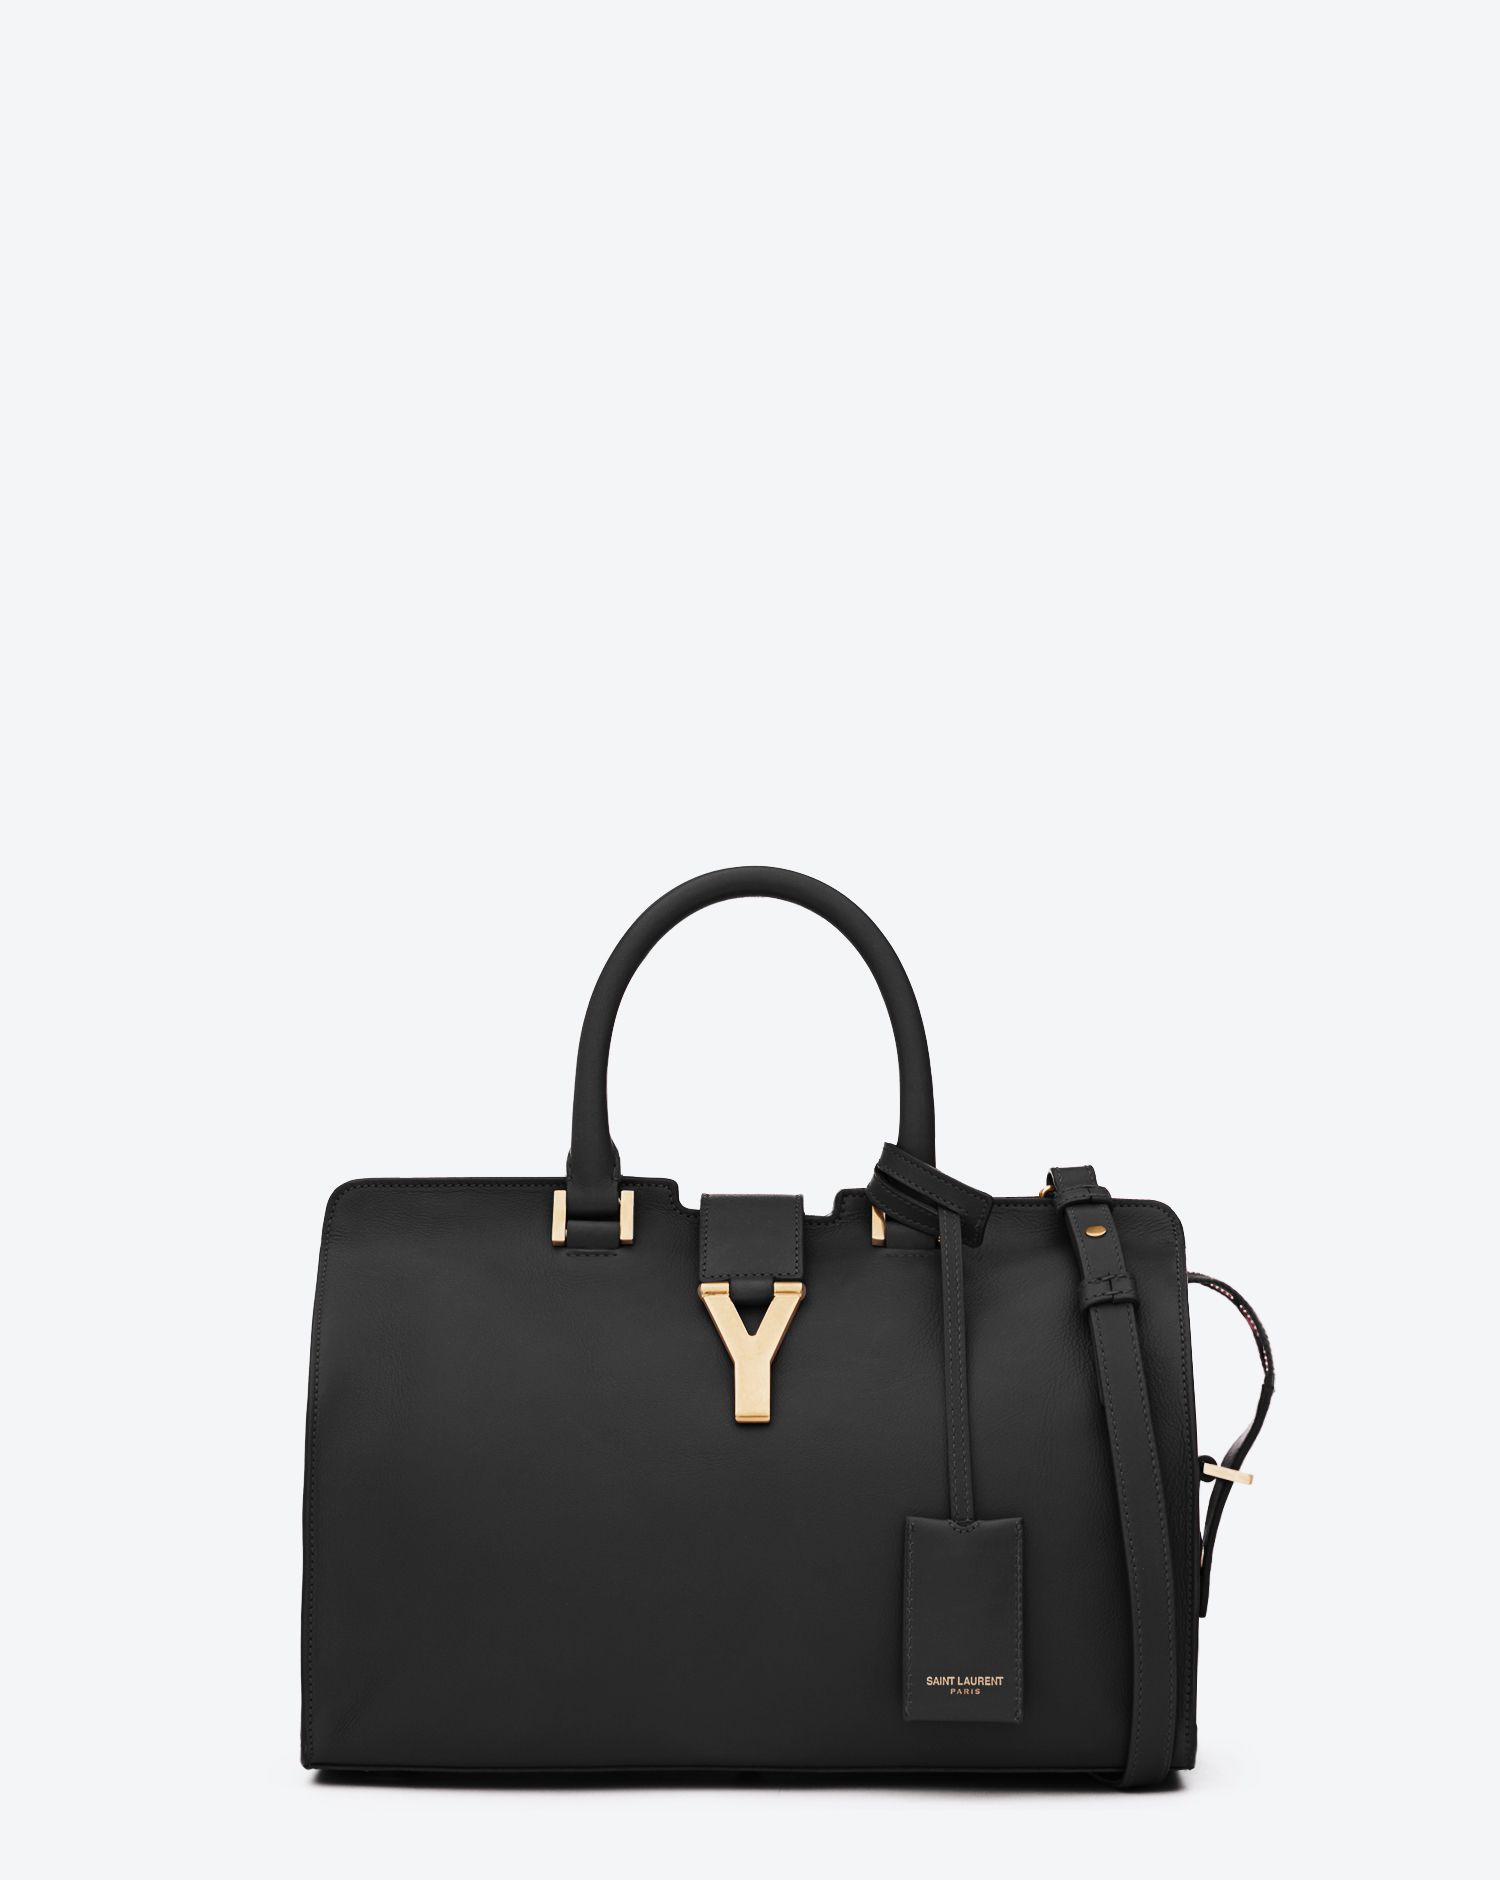 07977bbc405 Saint Laurent Classic Small Y Cabas Bag In Black Leather | ysl.com ...